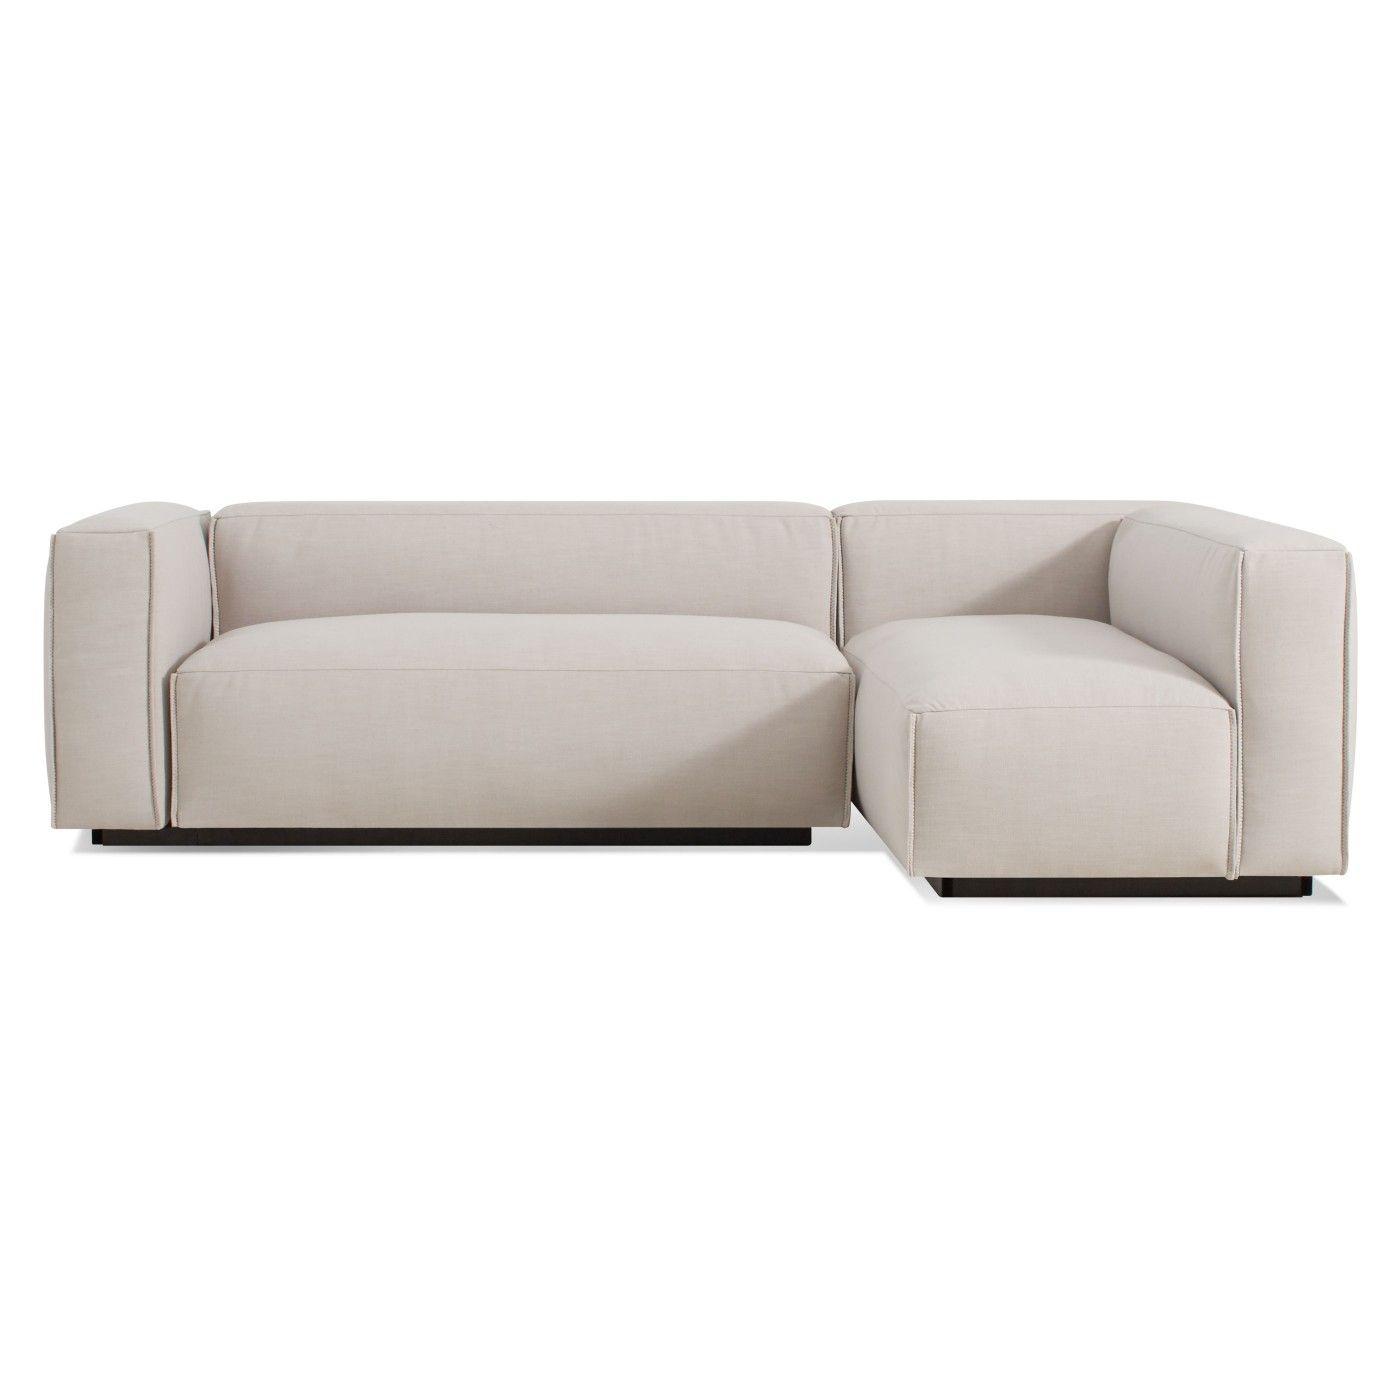 Cleon Small Sectional Sofa Modern Sofa Sectional Small